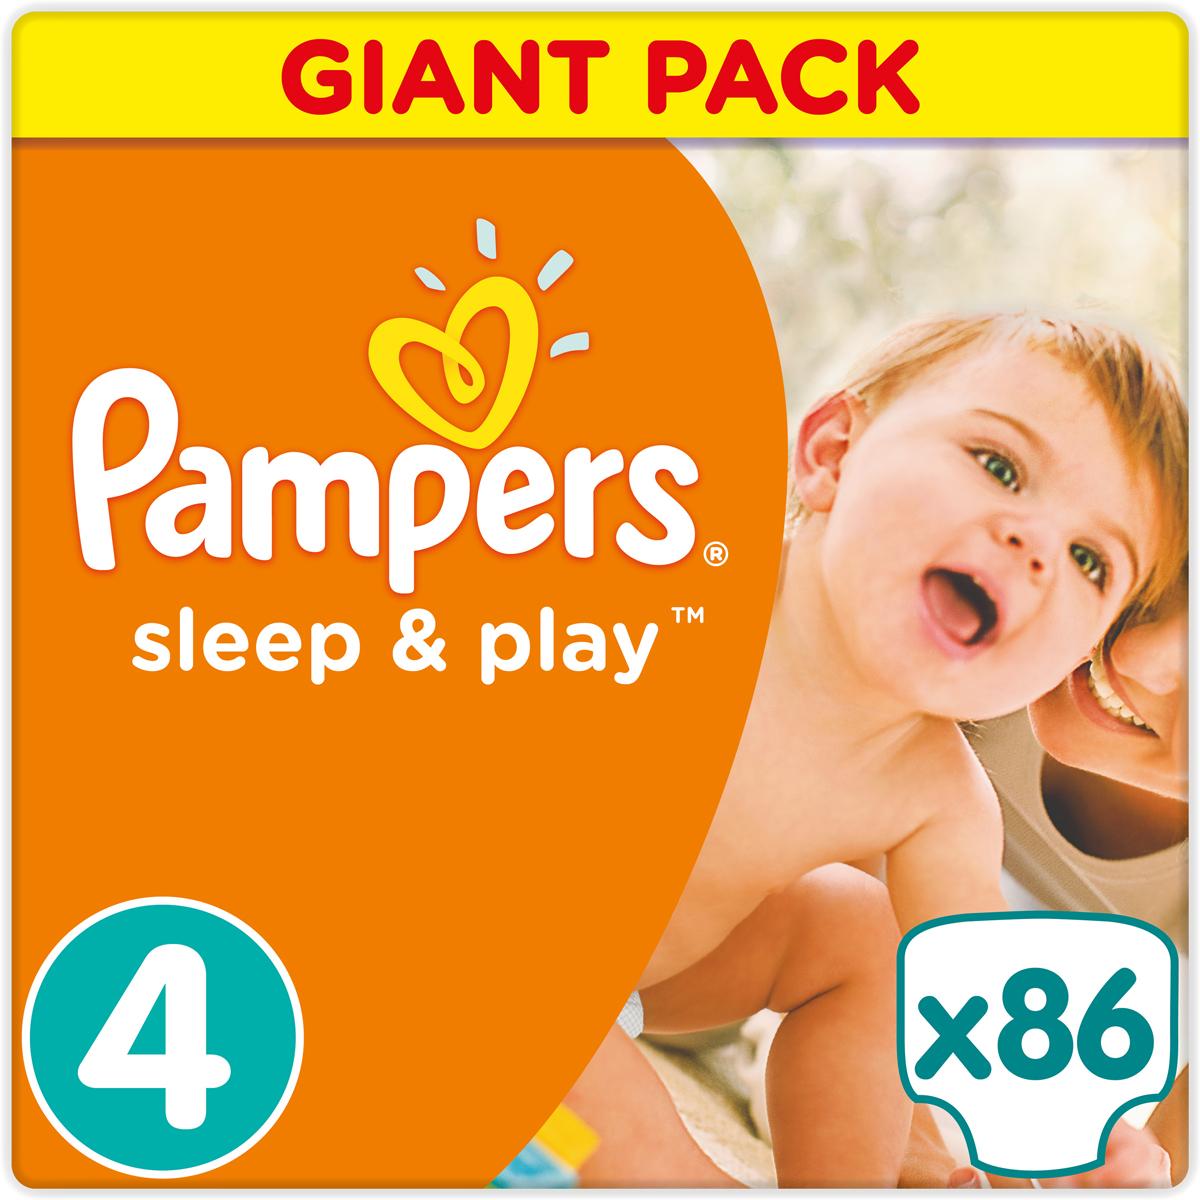 Pampers Sleep & Play Подгузники 4, 8-14 кг, 86 шт - Подгузники и пеленки